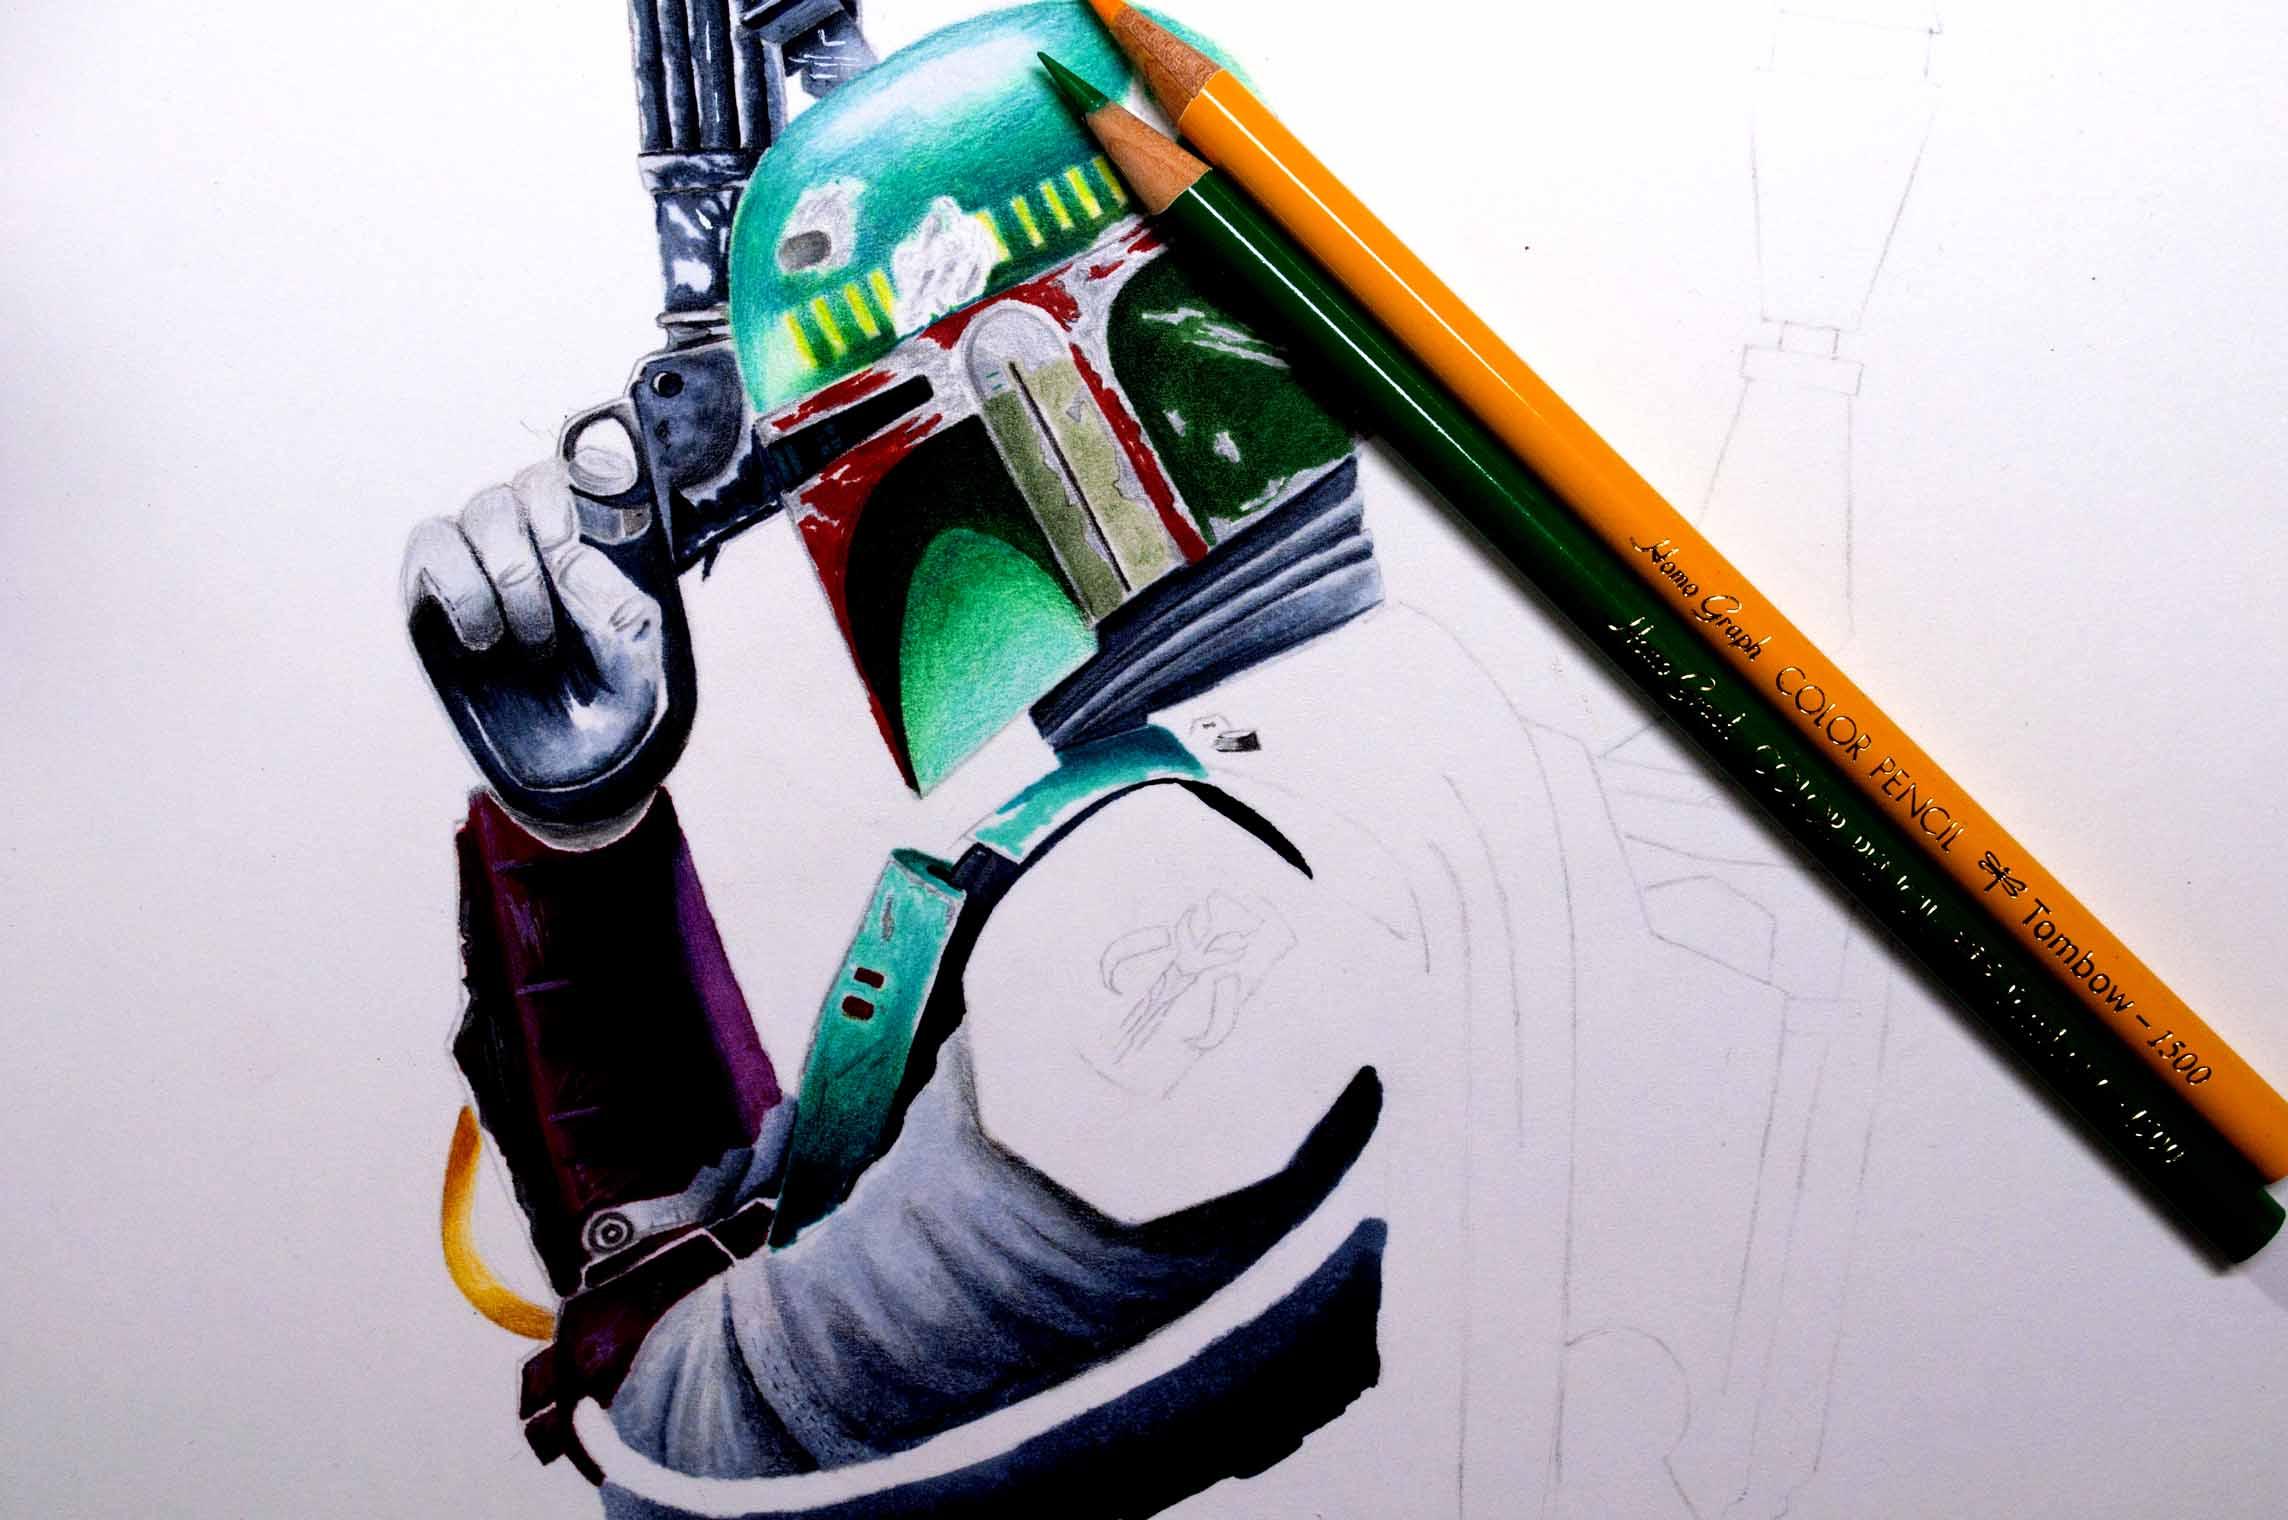 Bobafett Image 3 With Pencils.jpg